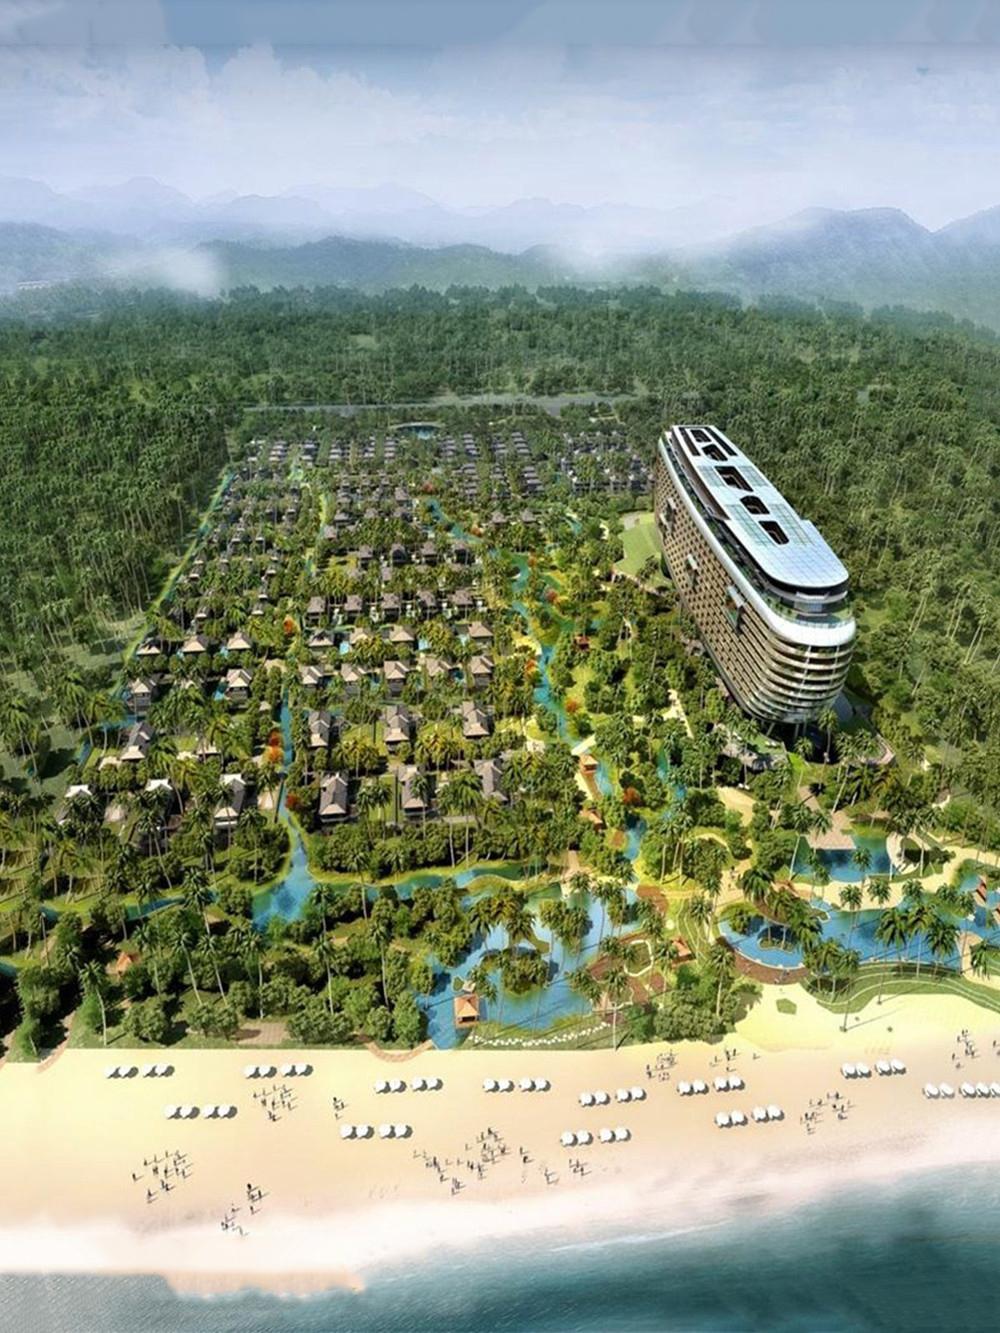 http://yuefangwangimg.oss-cn-hangzhou.aliyuncs.com/uploads/20200117/6092f6dddcfe208c0cd133ce98b461c9Max.jpg